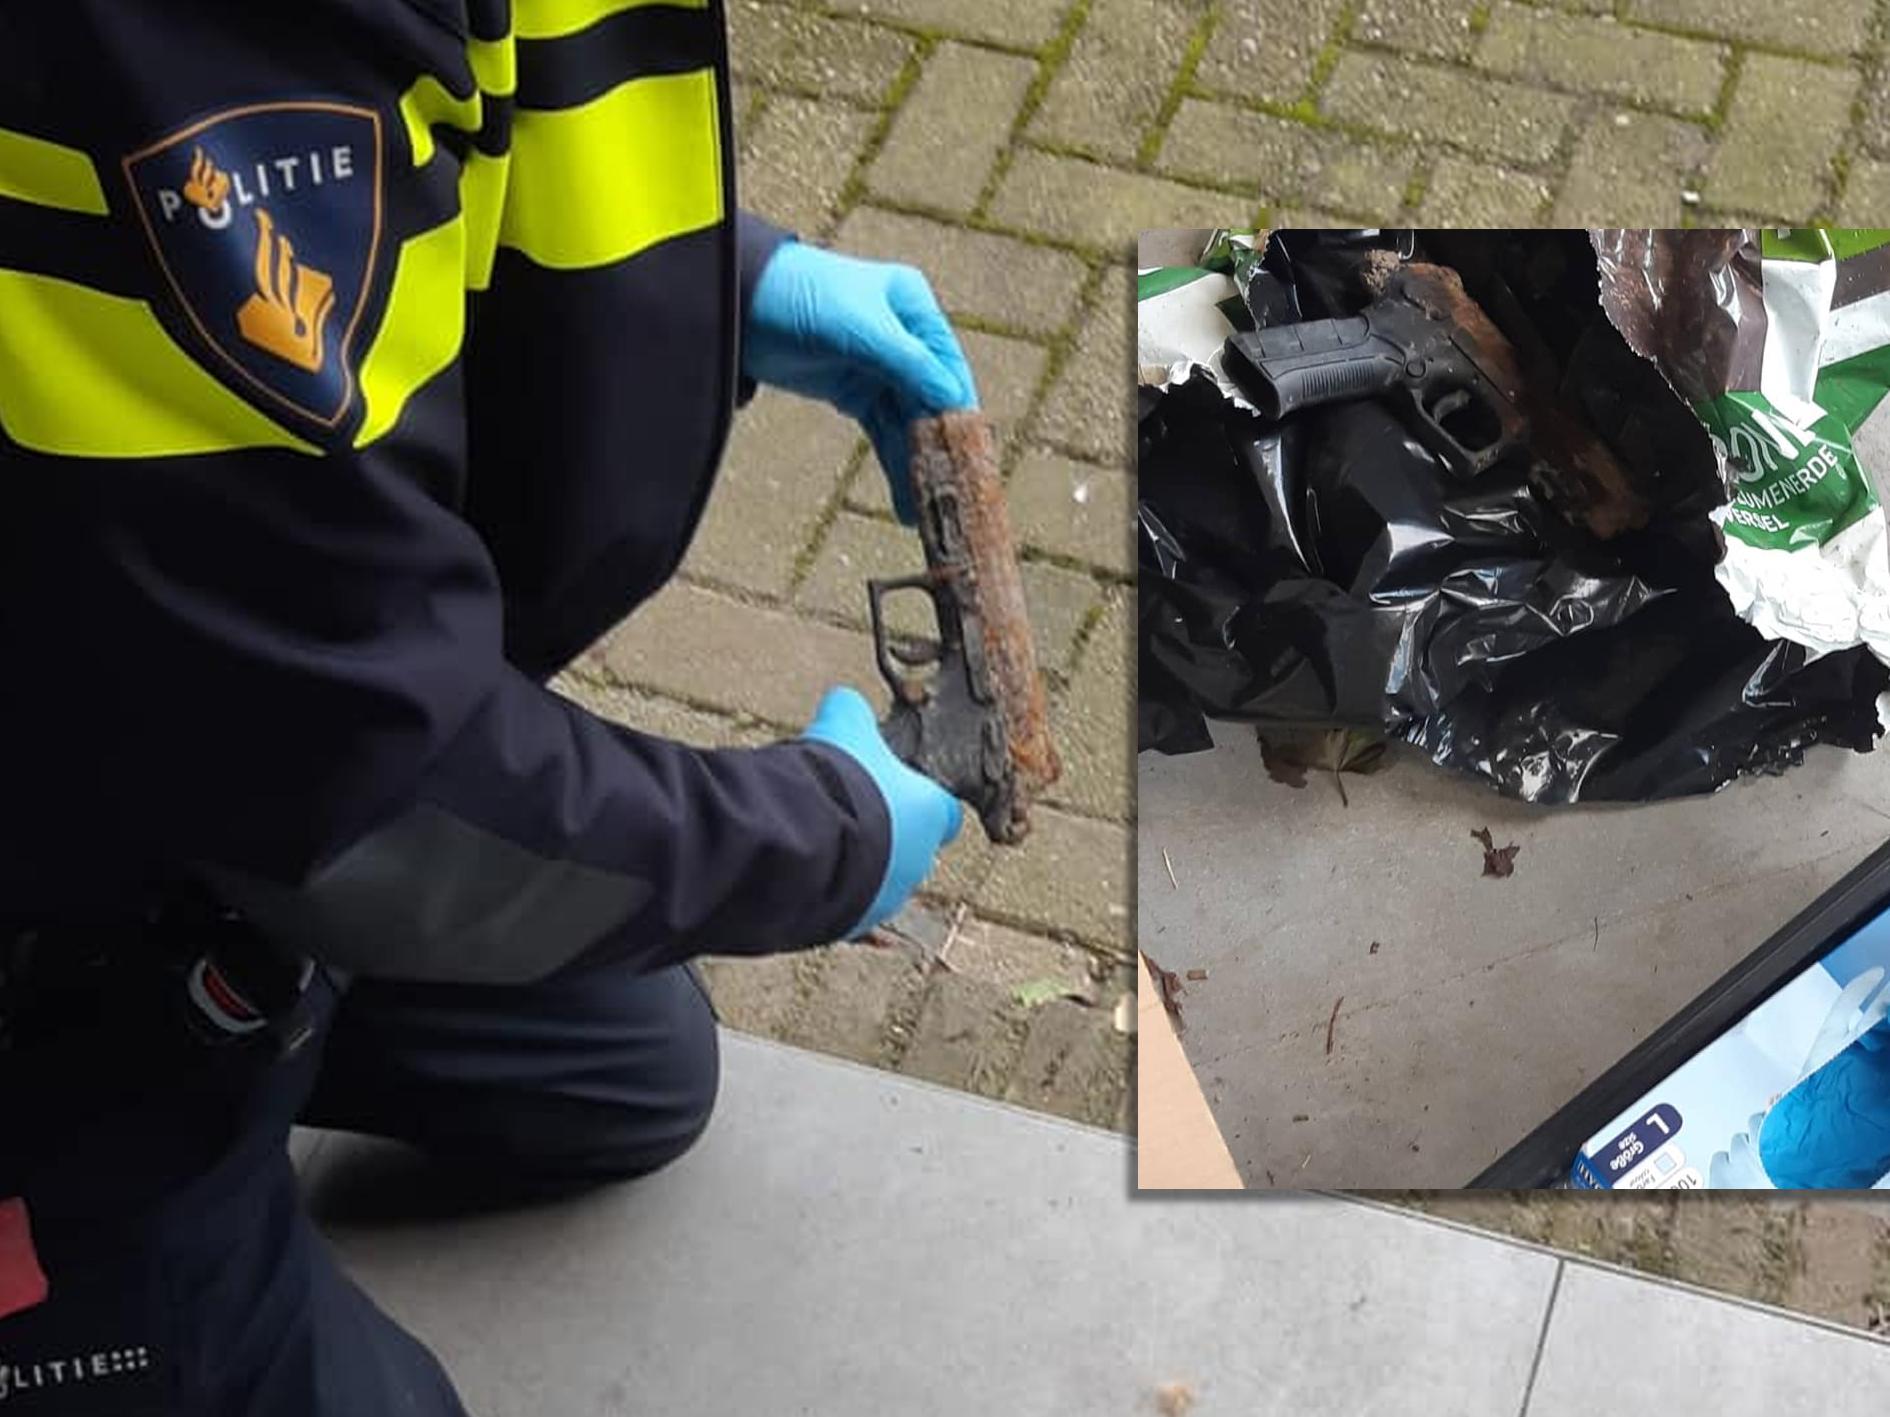 Vuurwapen gevonden langs snelweg Barendrecht